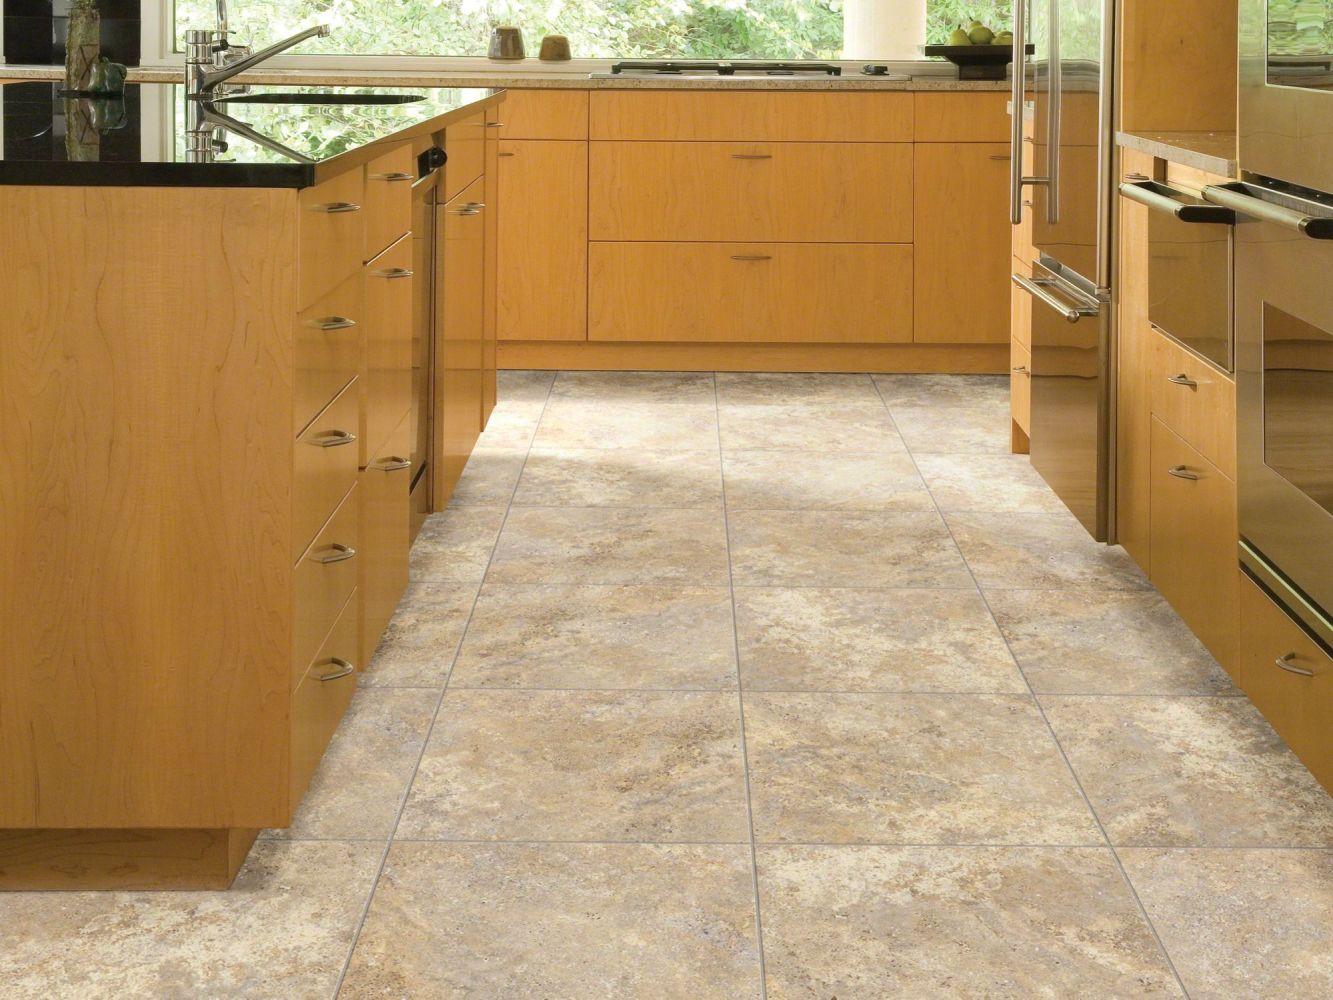 Shaw Floors Lennar Homes Oasis Tile Cashmere 00240_LR809